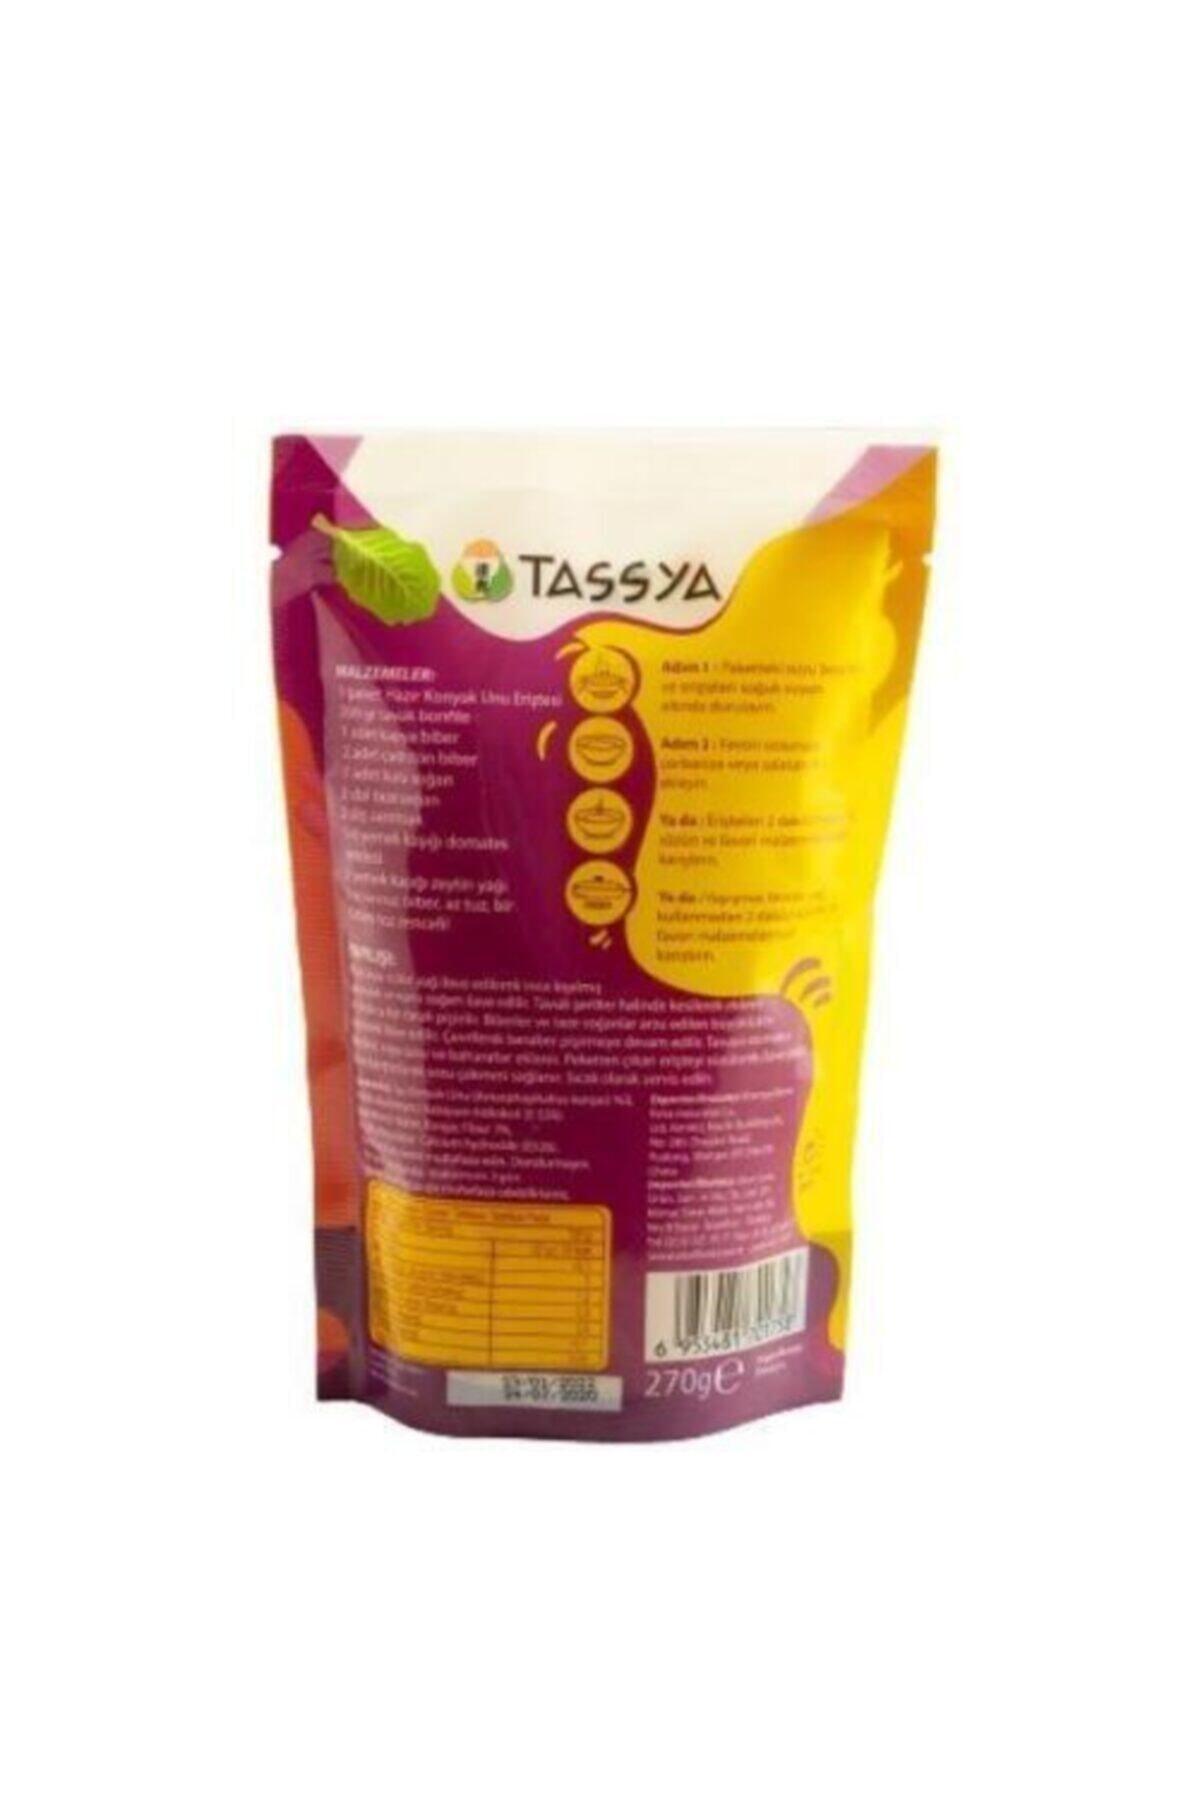 Tassya Shirataki (konjac) Noodle 270 G 2